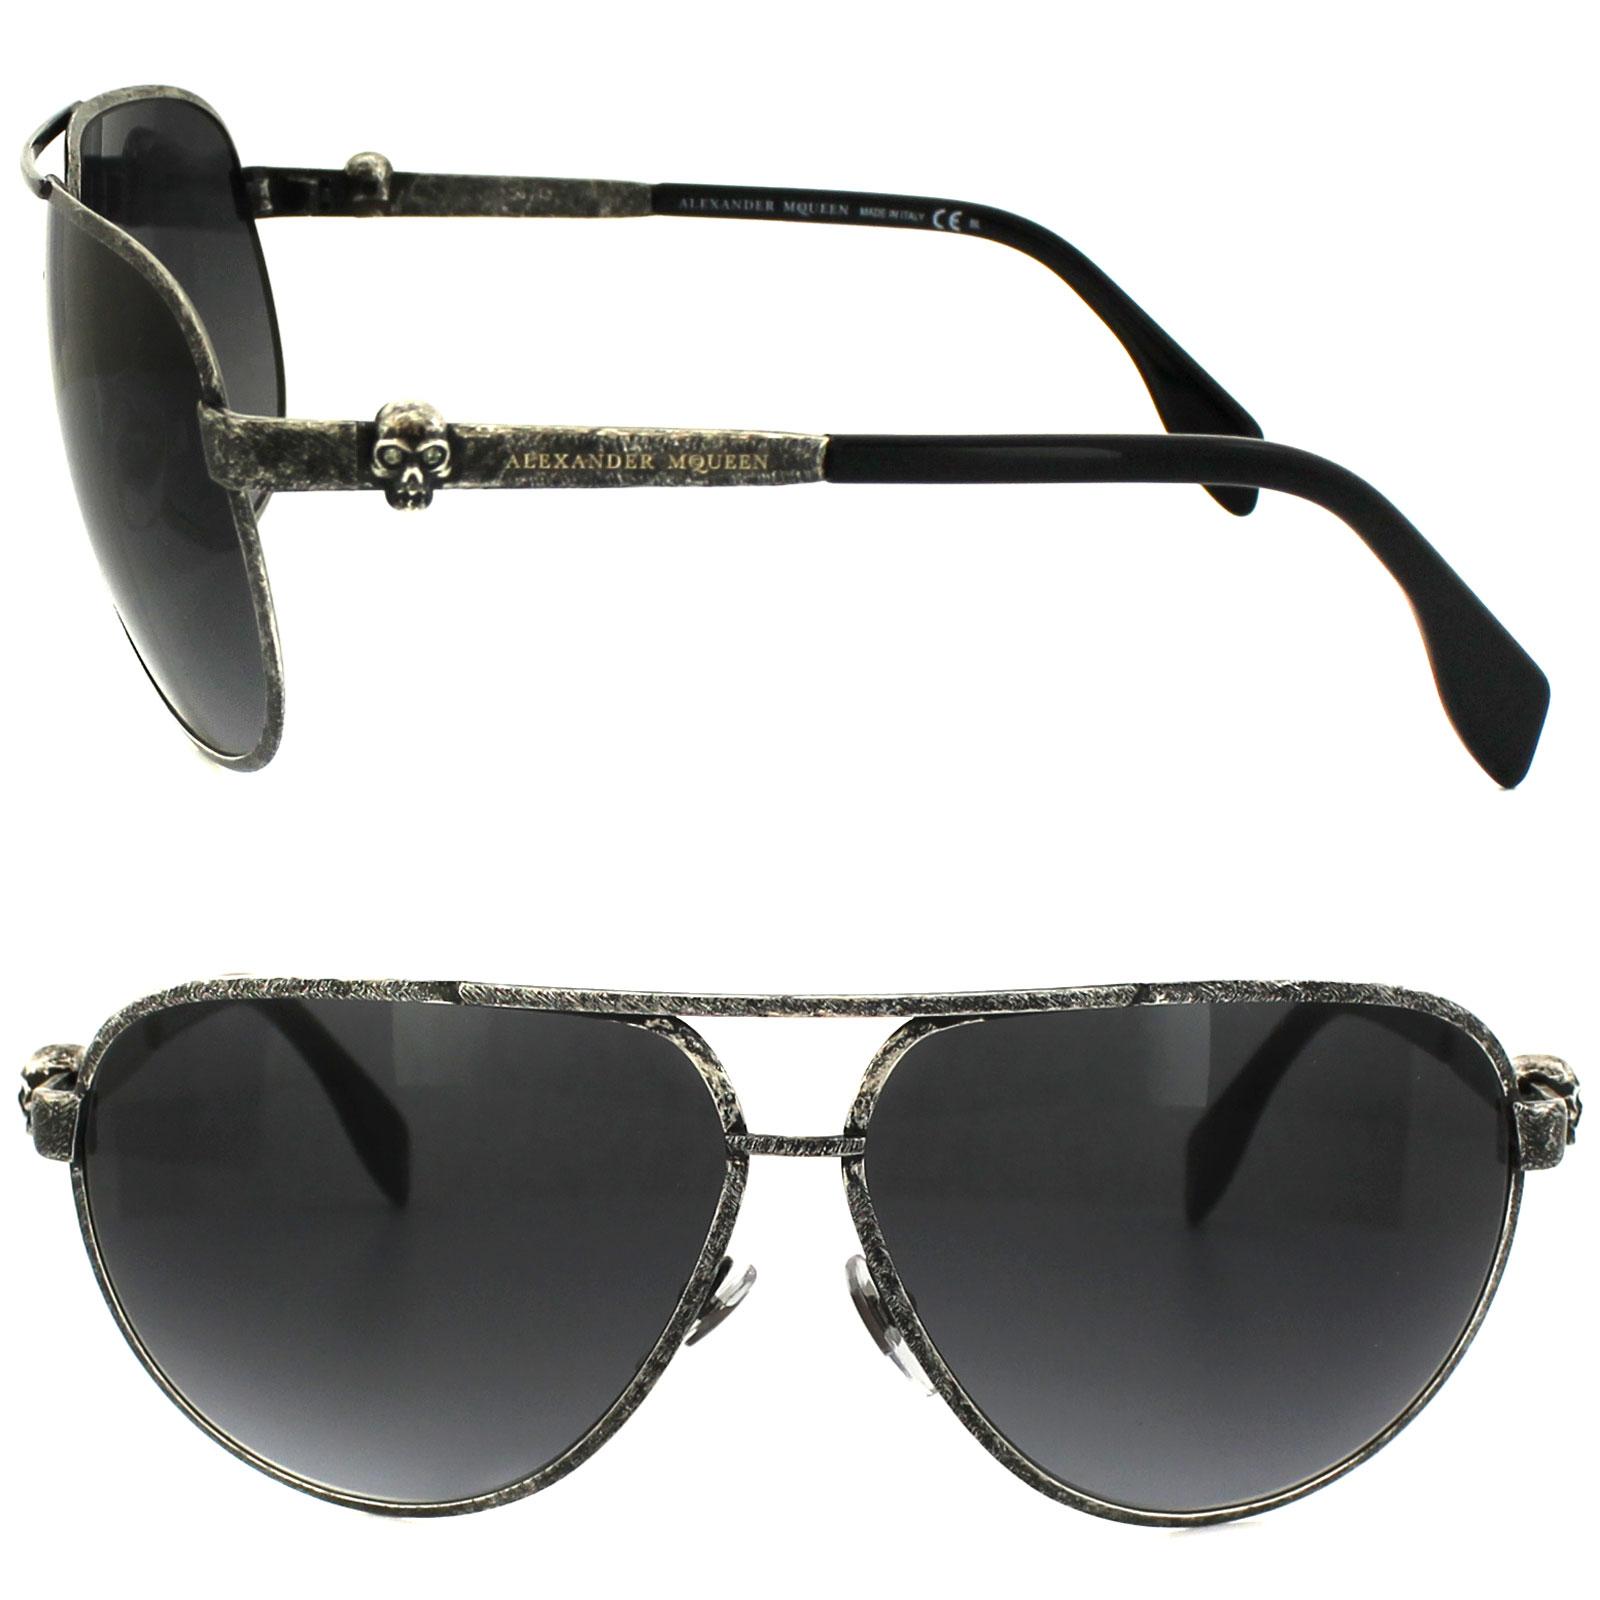 Alexander Mcqueen Sunglasses  alexander mcqueen sunglasses 4156 s obr hd oxidized ruthenium grey